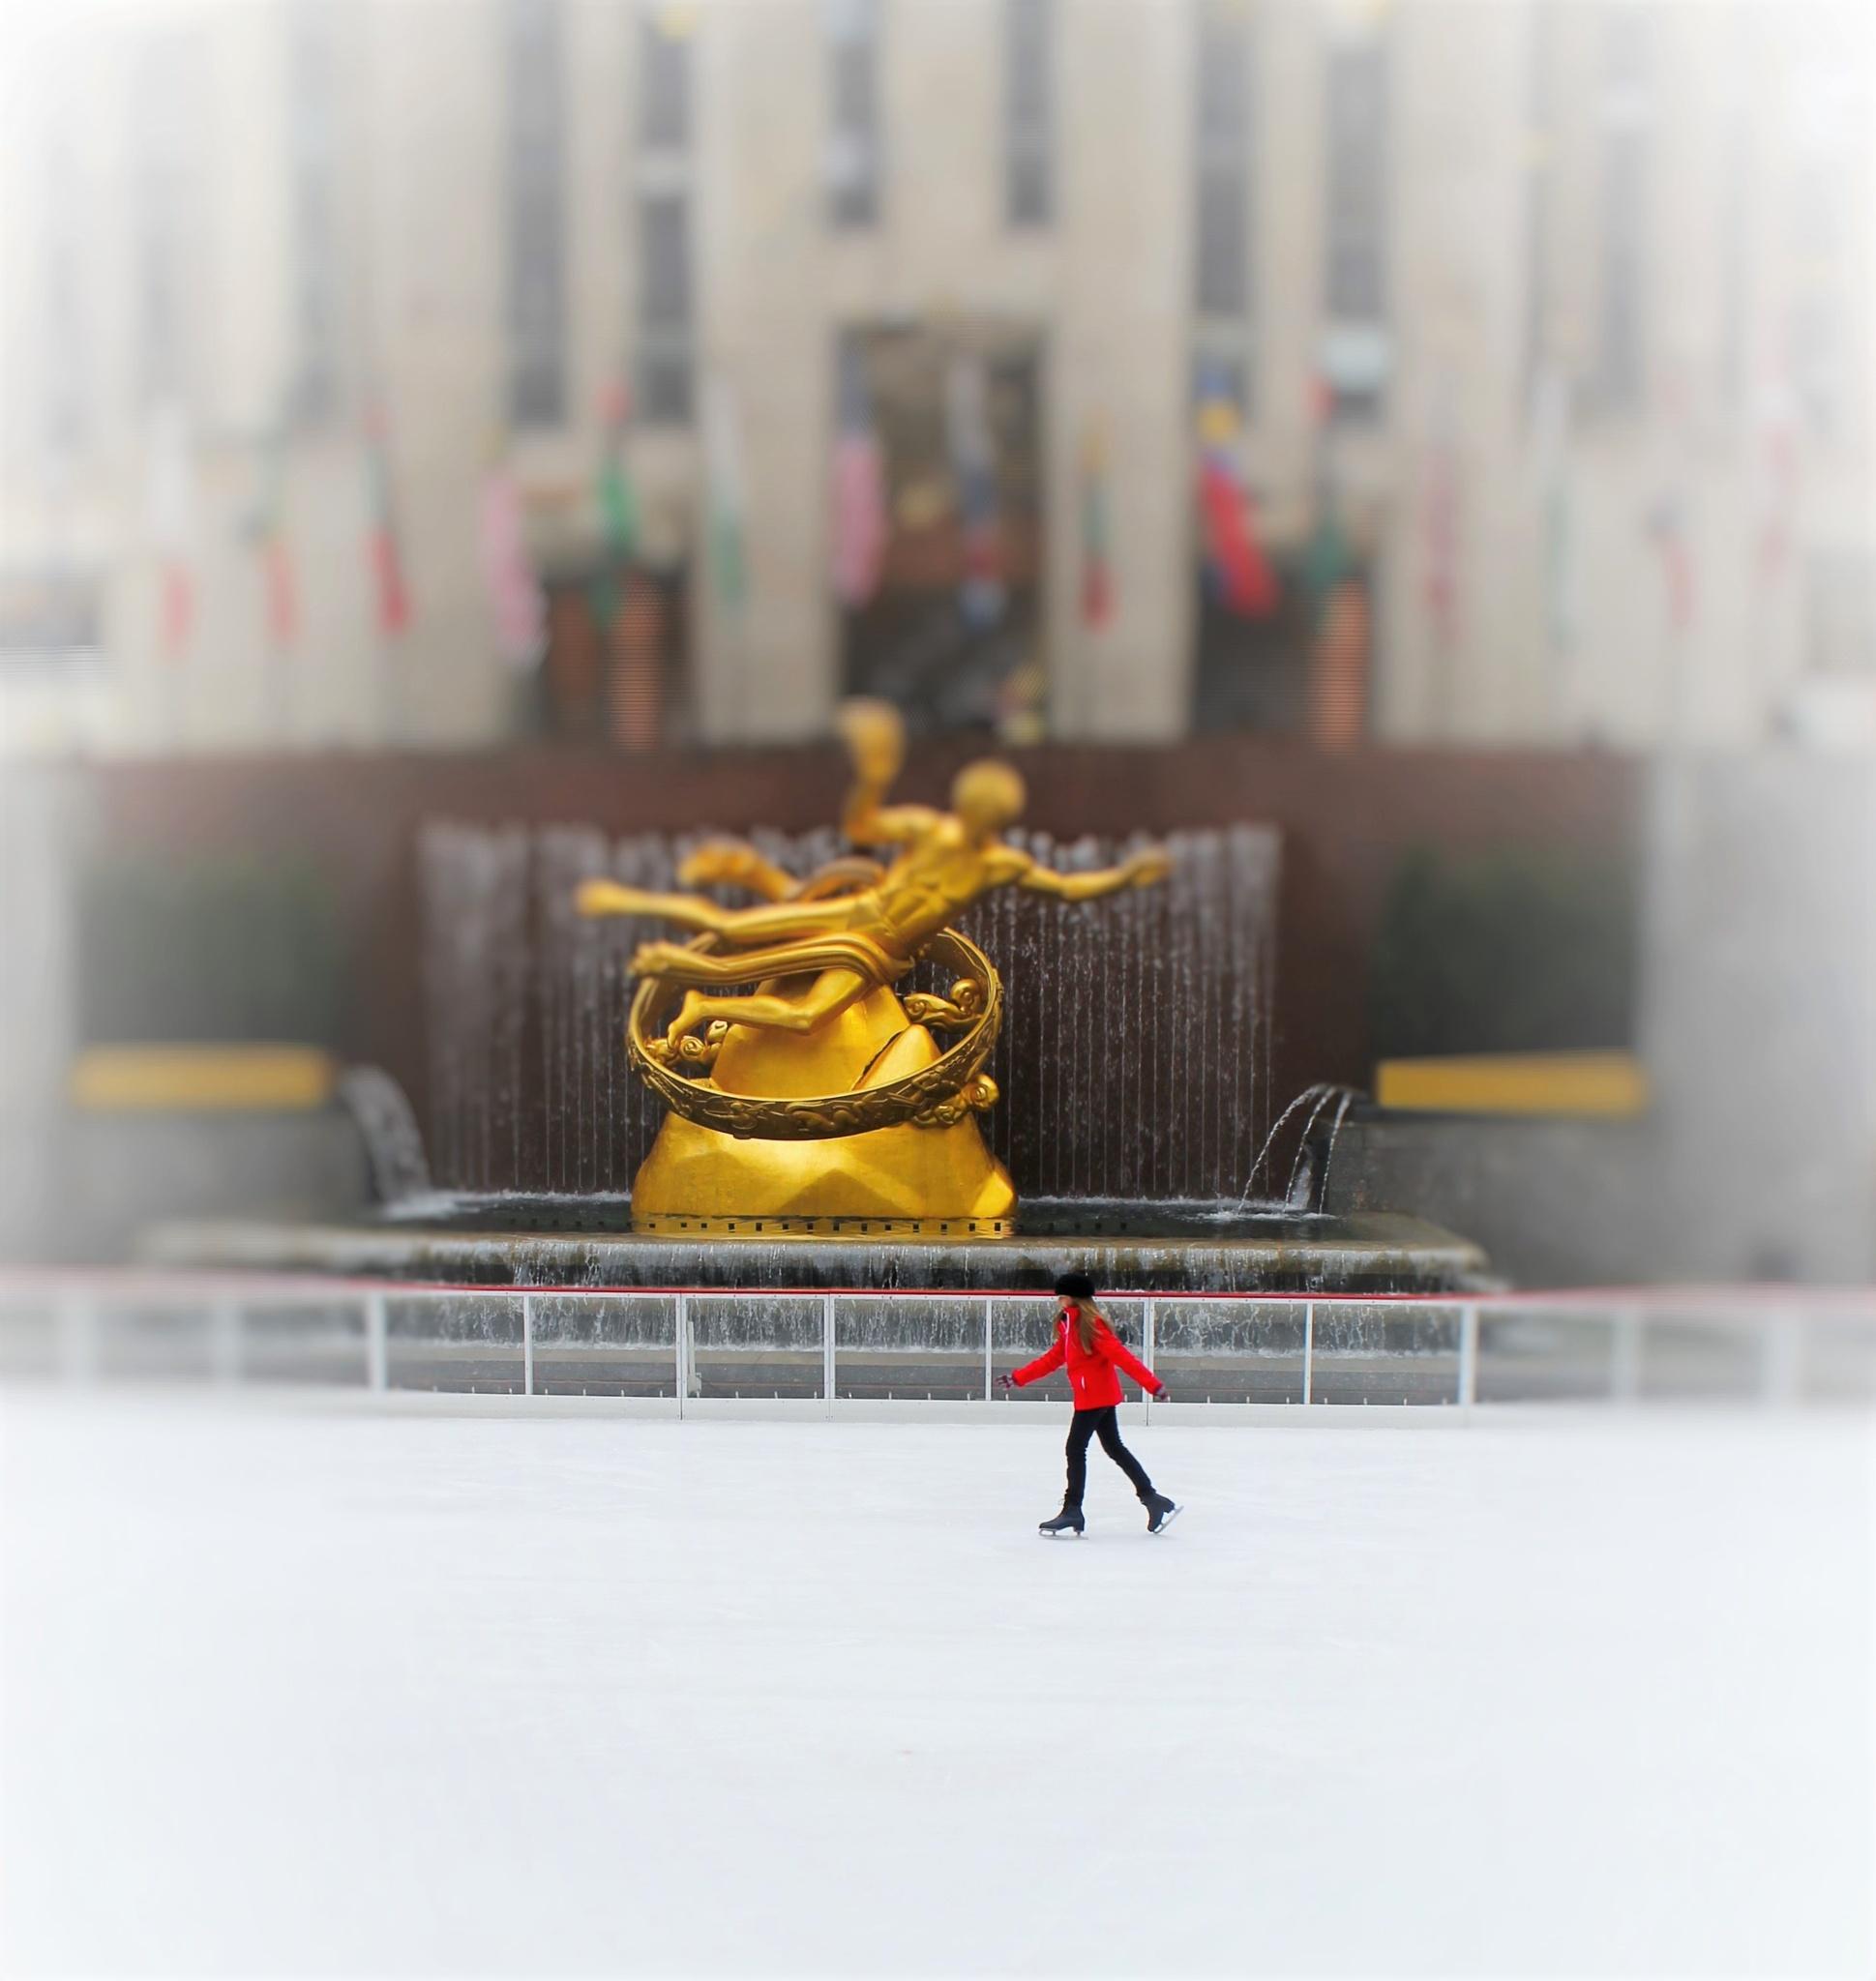 ice skating alone , by Liborio Drogo